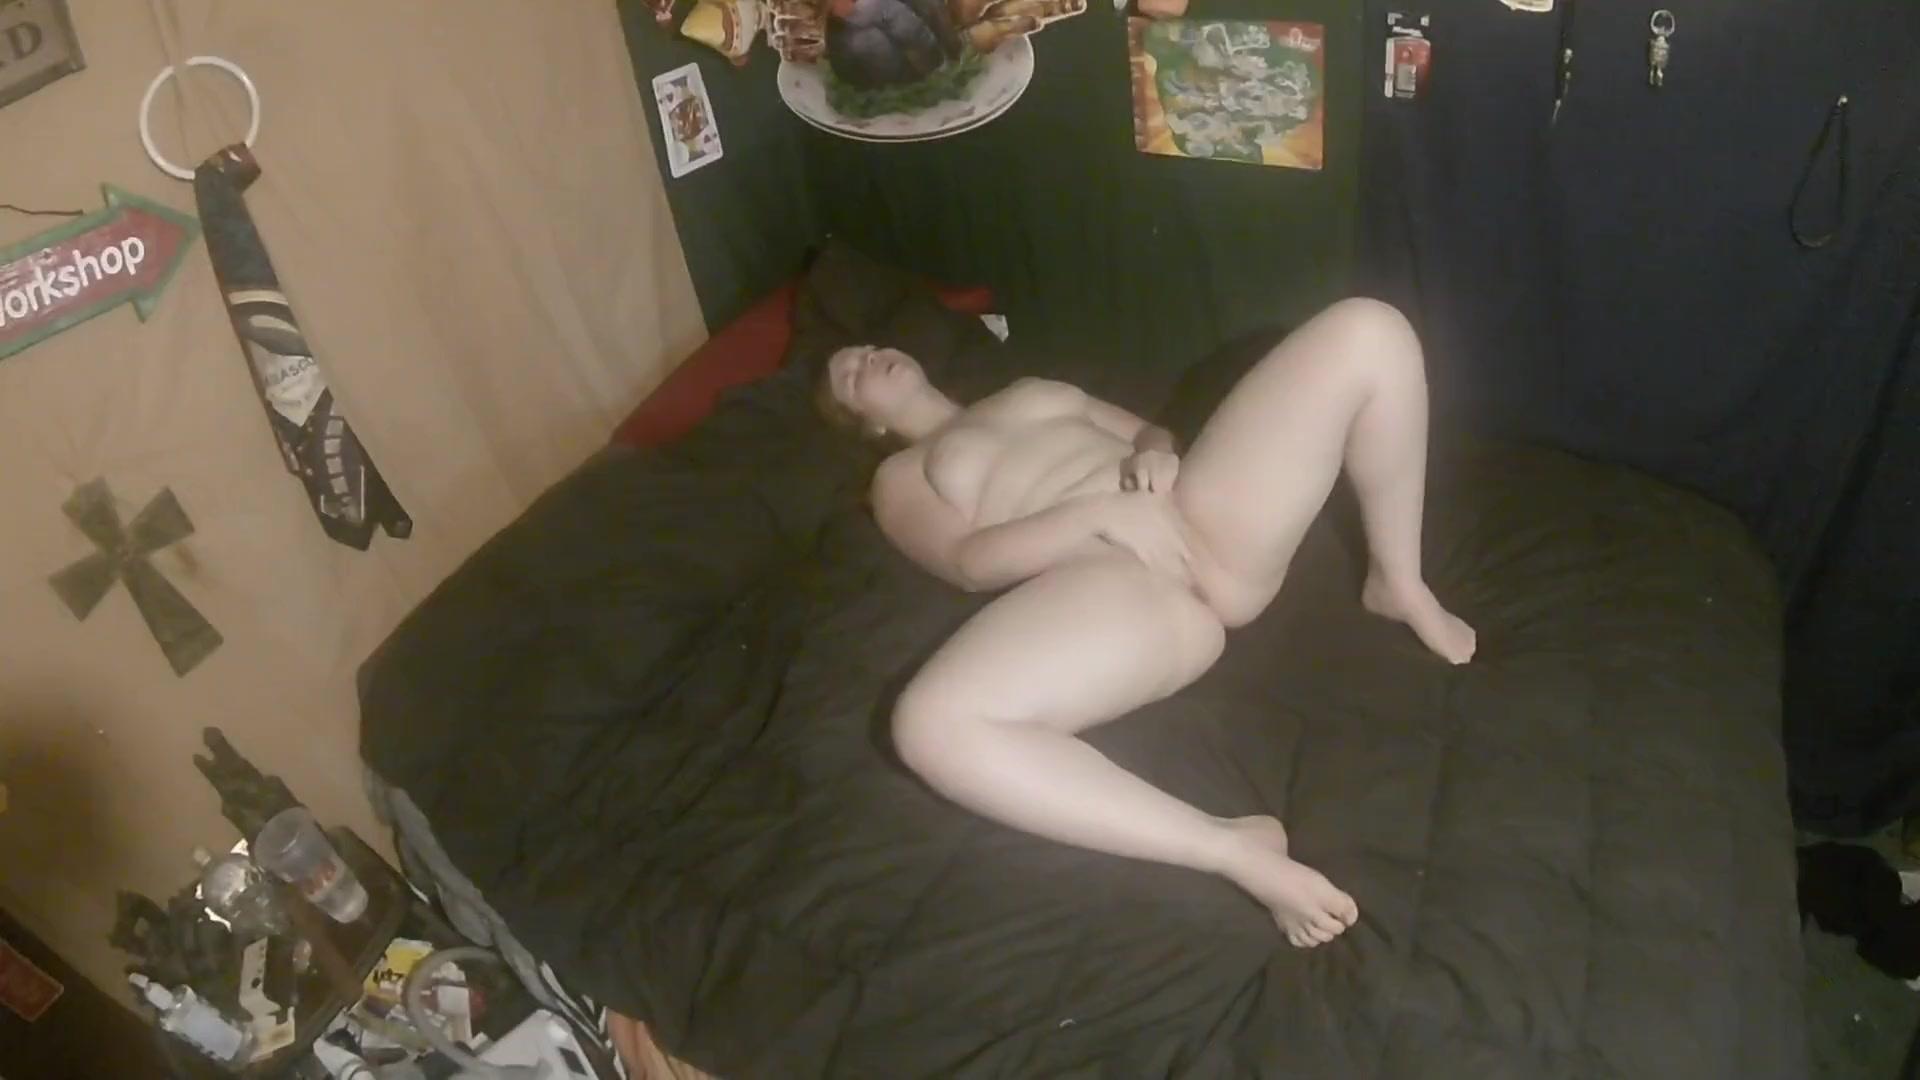 Voyeur body therapist. disorder erotic